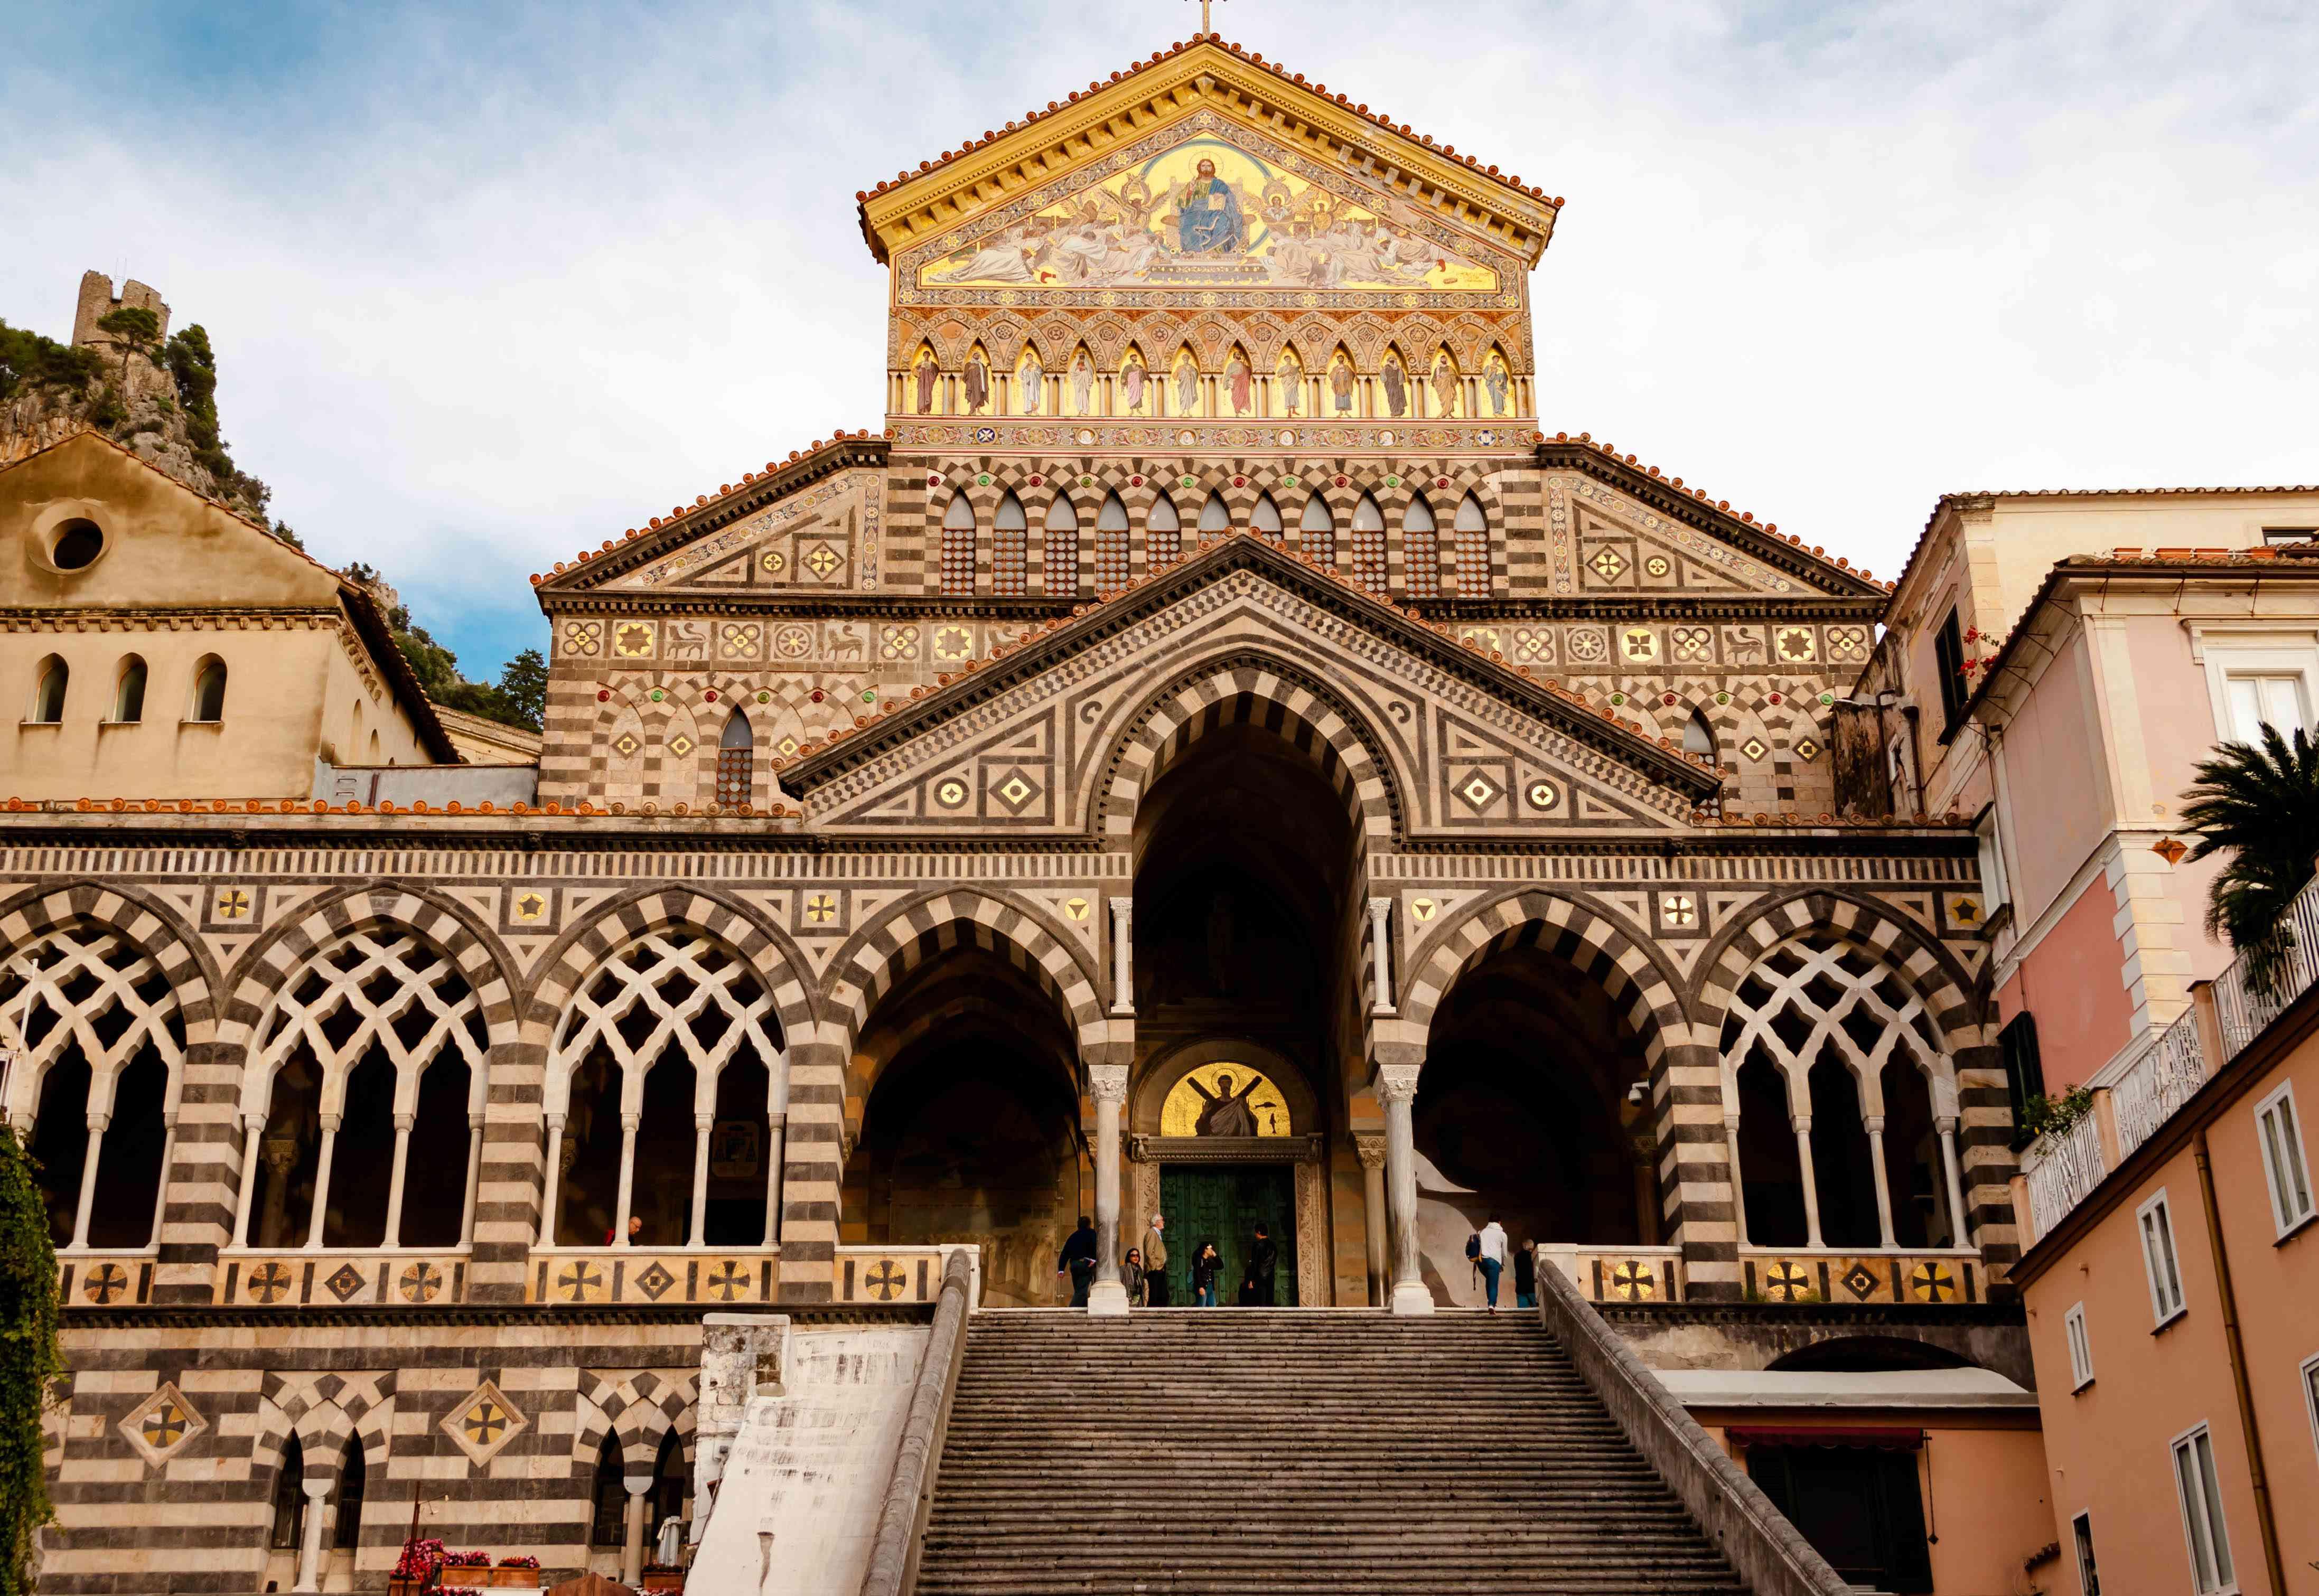 AMALFI, ITALY NOVEMBER 7 2019: Italian Amalfi Cathedral duomo di Sant'andrea Church of St. Andrew